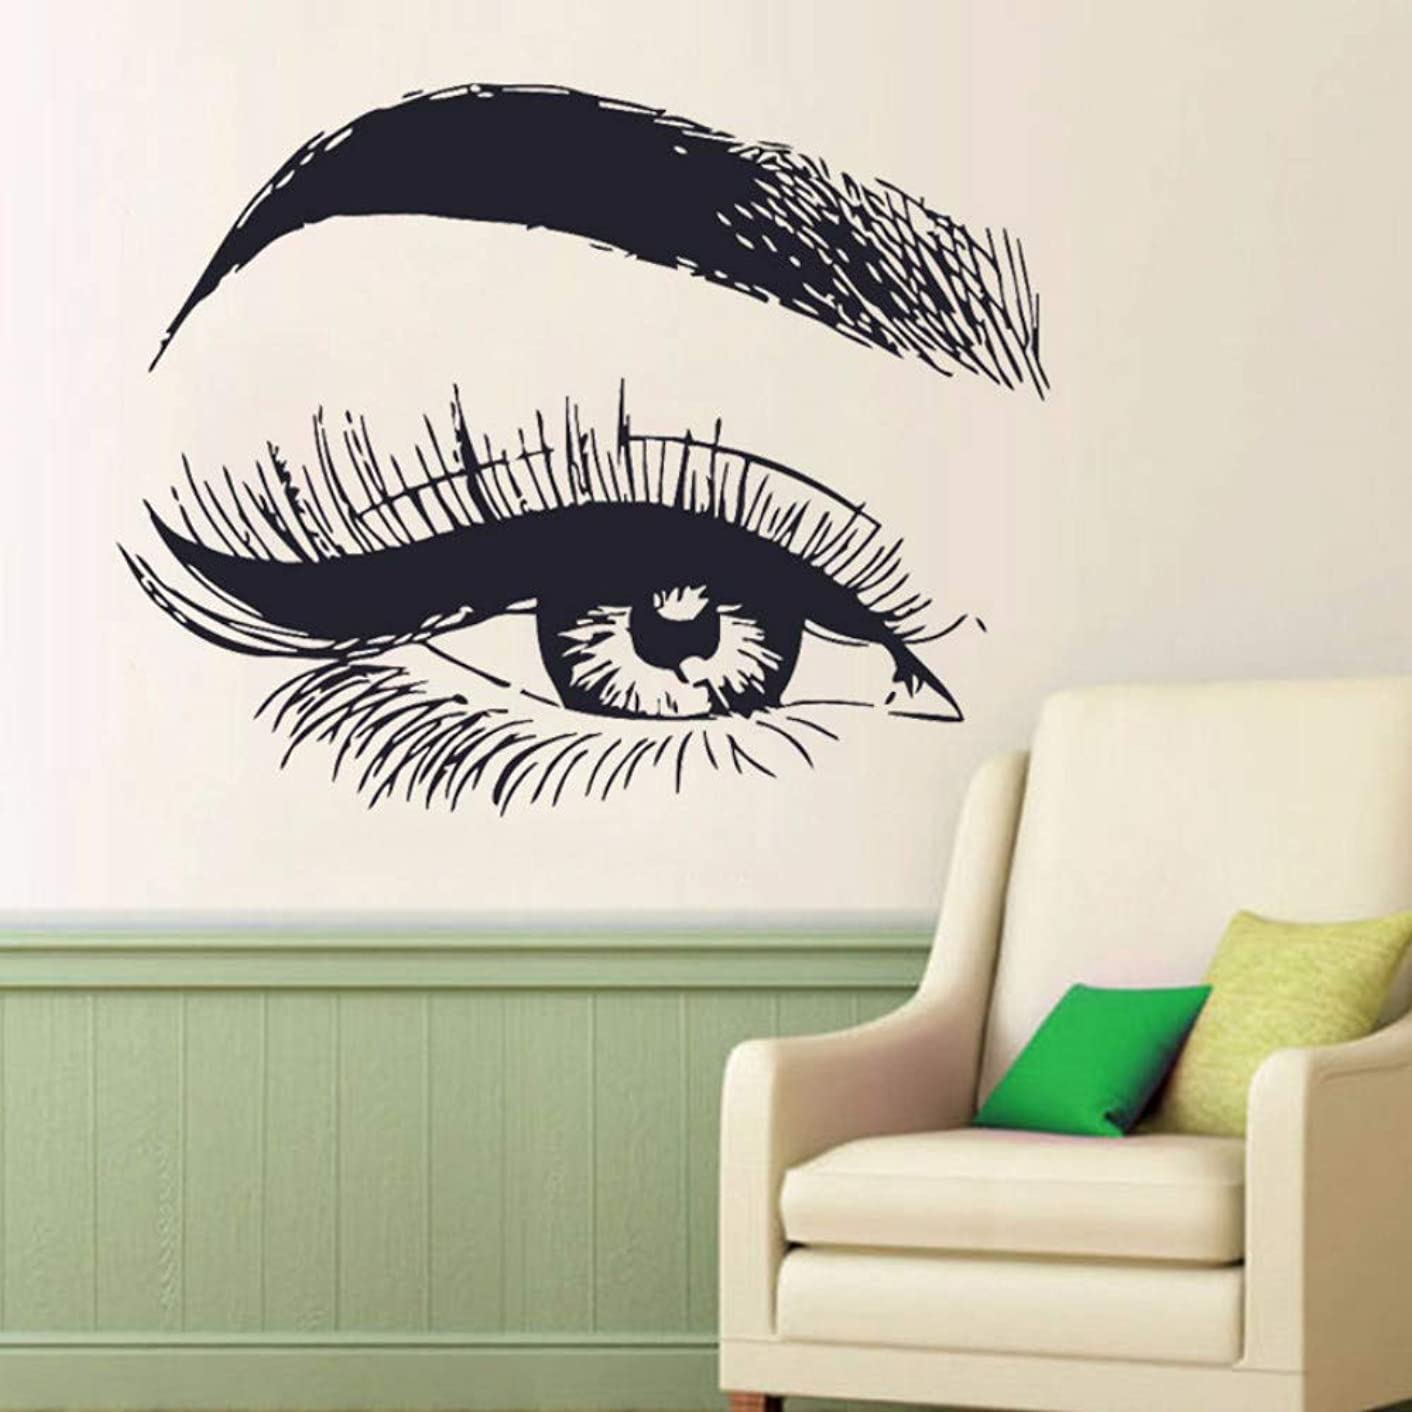 Eye Eyelashes Wall Decal Sticker Lashes Eyebrows Brows Beauty Salon Vinyl Art Decals Girl Bedroom Decor 53X42CM